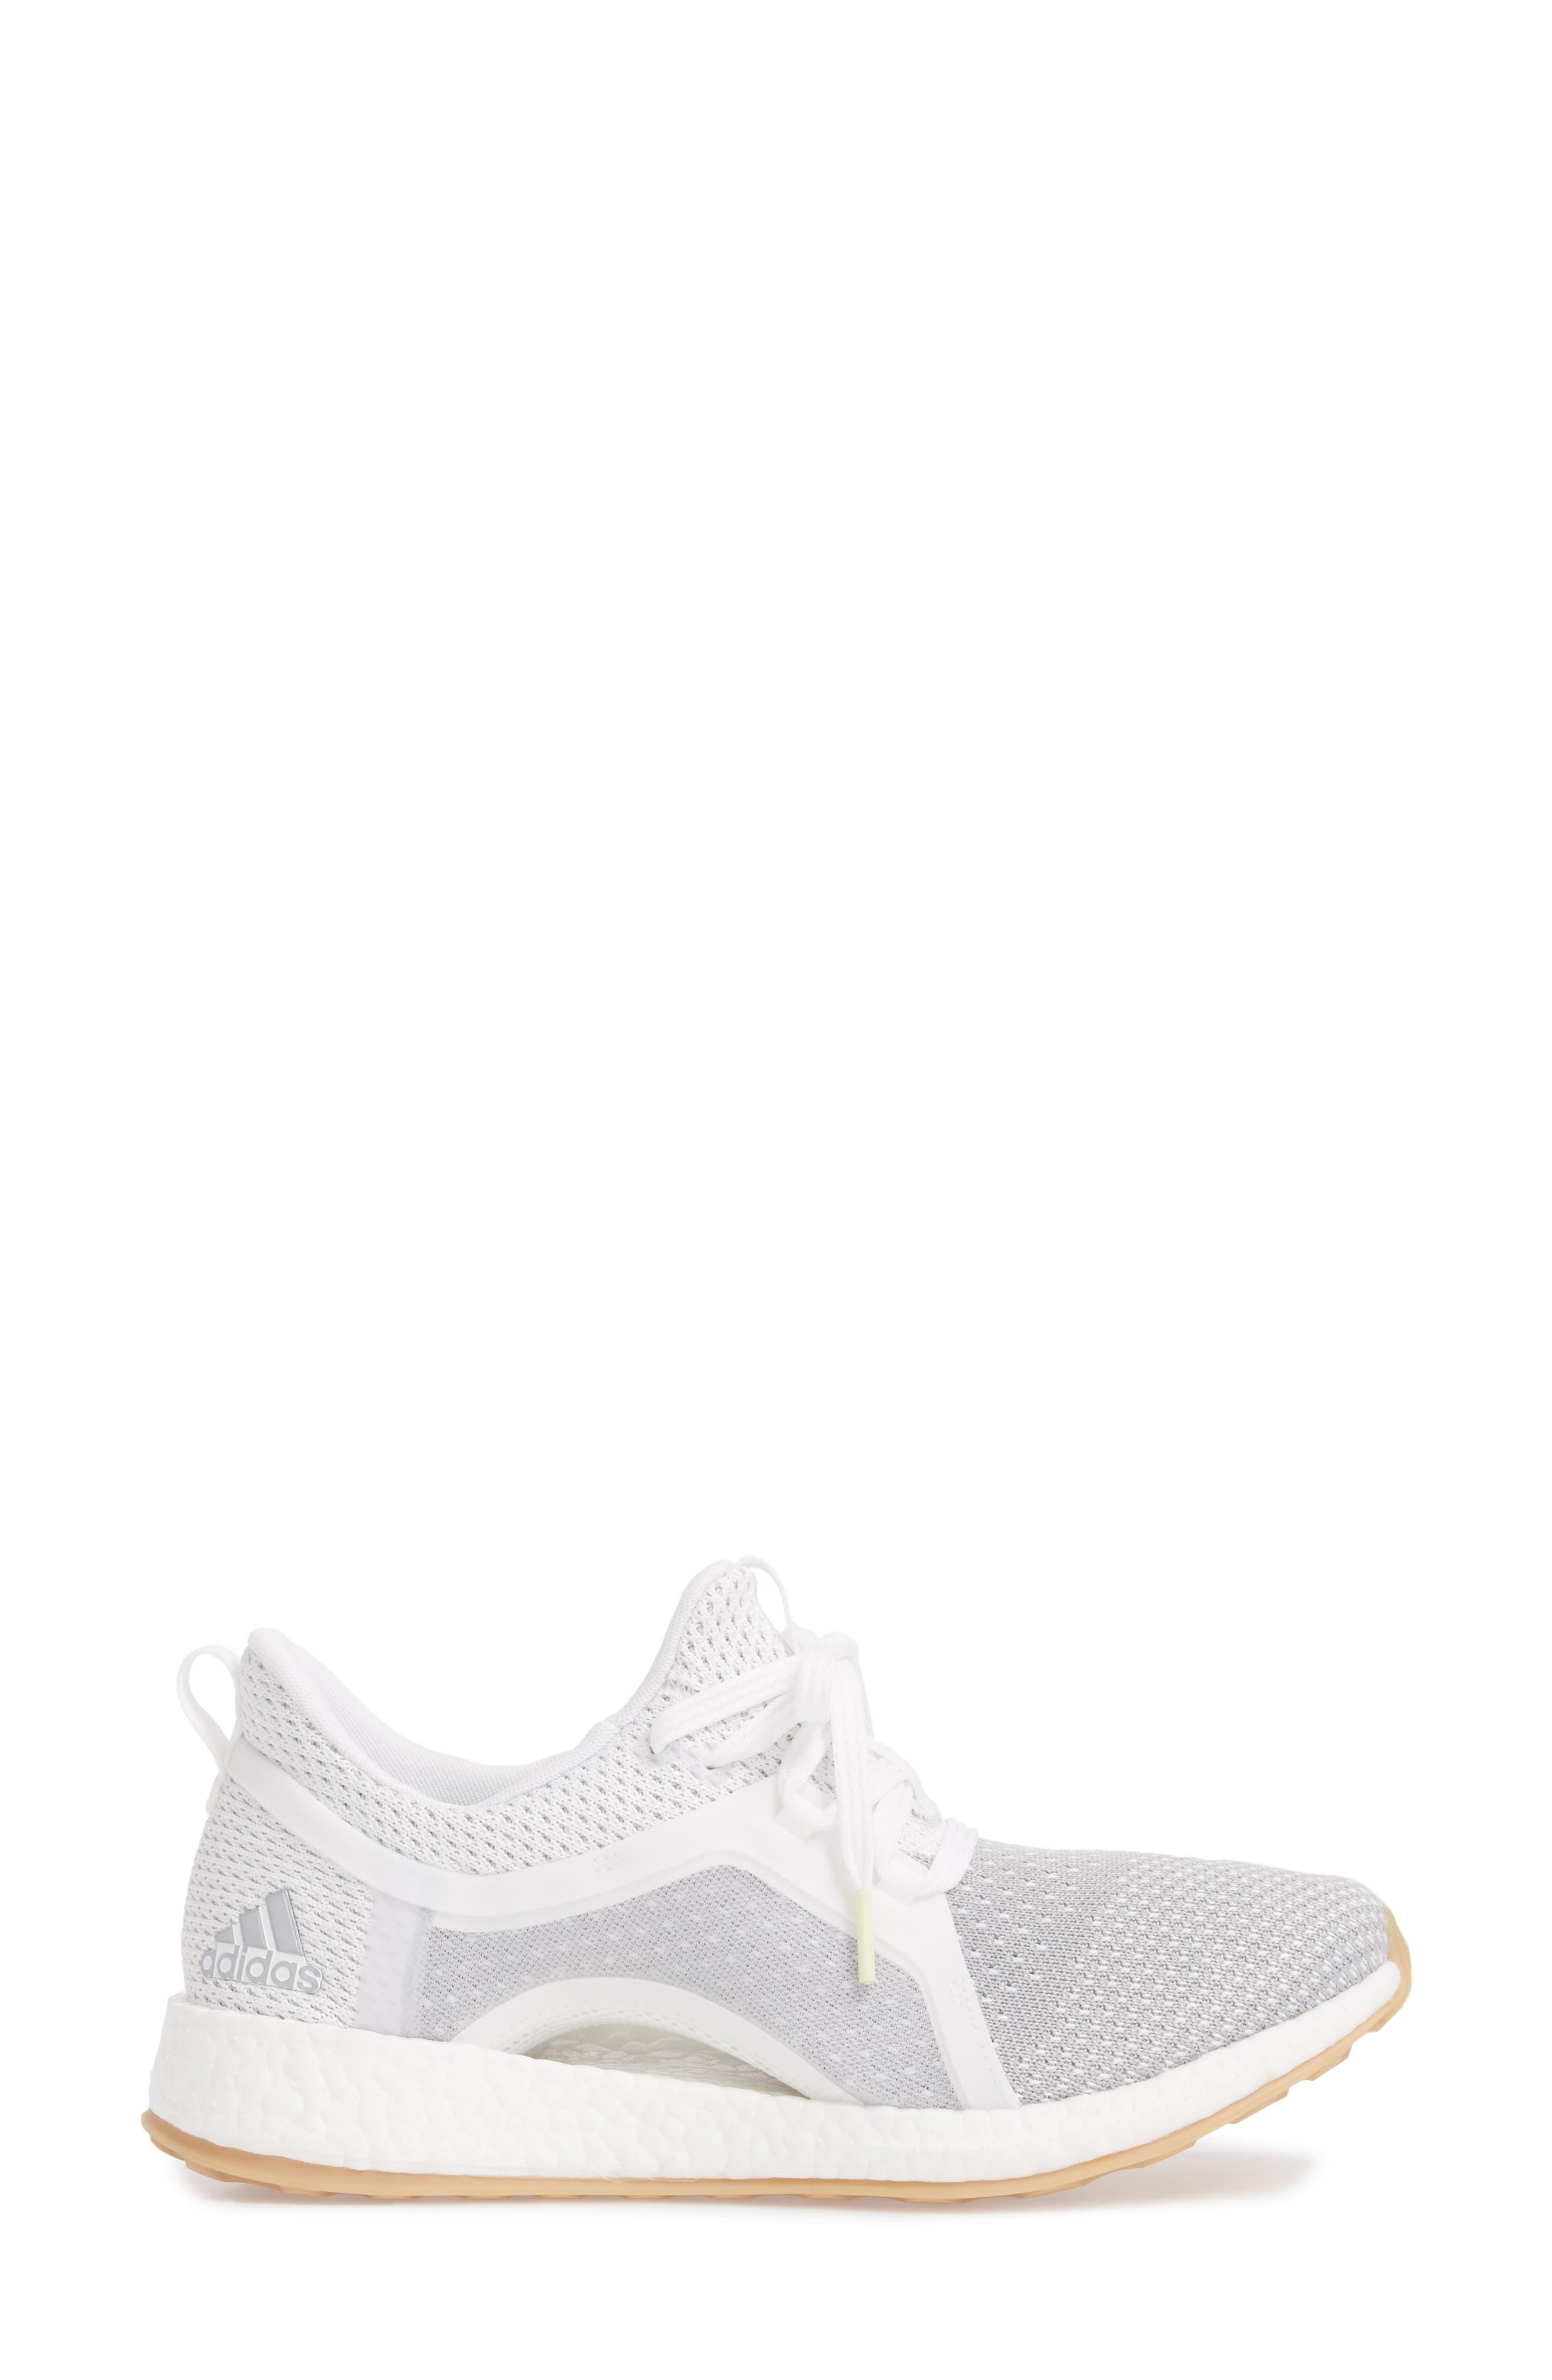 Pureboost X Clima Sneaker,                             Alternate thumbnail 3, color,                             White/ Silver/ Grey